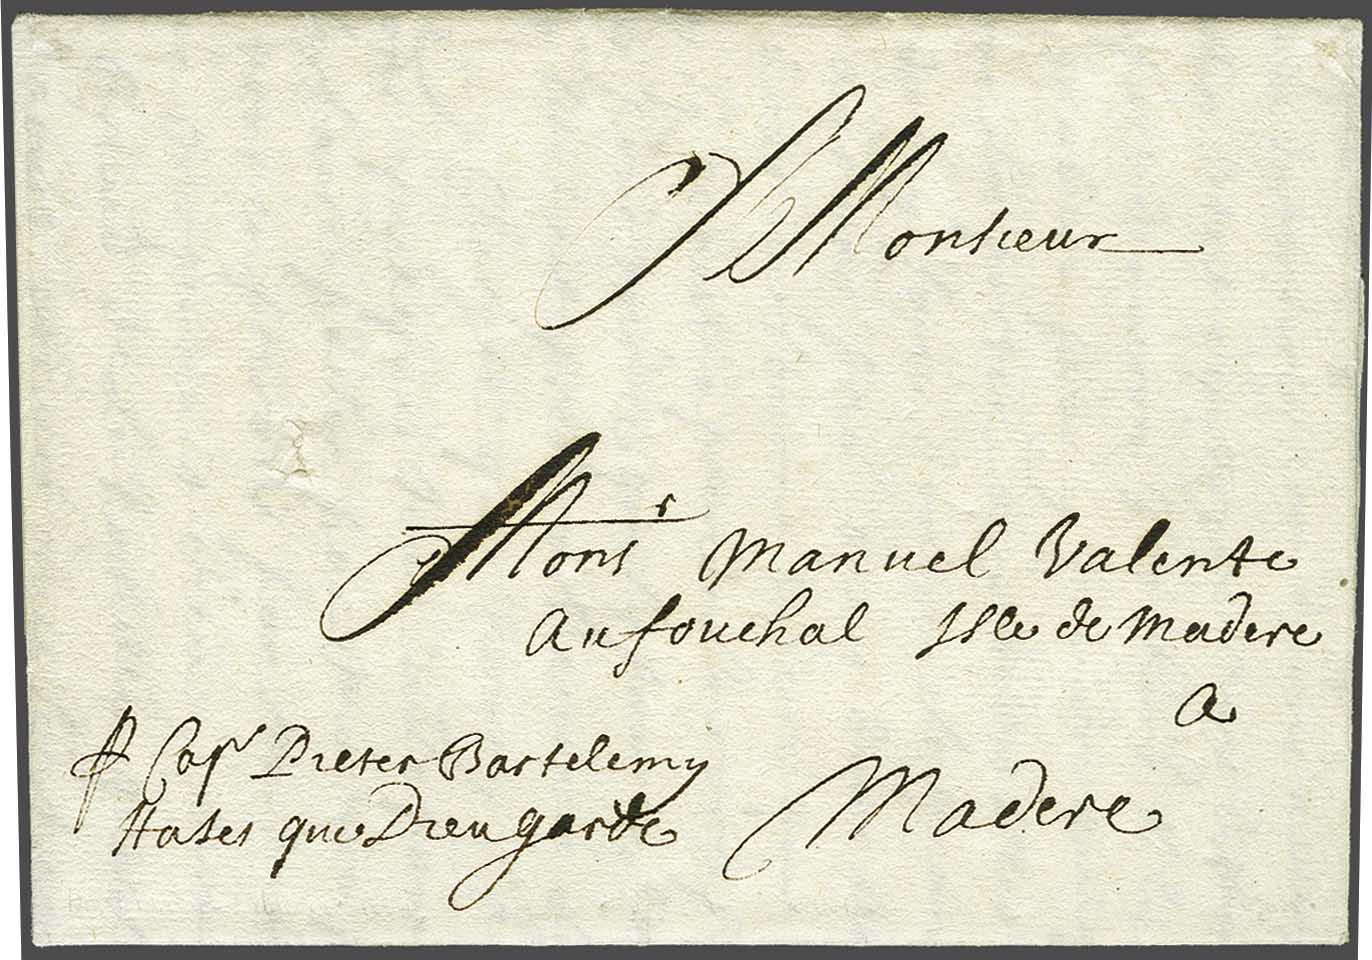 Lot 19 - Netherlands and former colonies Netherlands -  Corinphila Veilingen Auction 240: Pre-philately Netherlands and former colonies